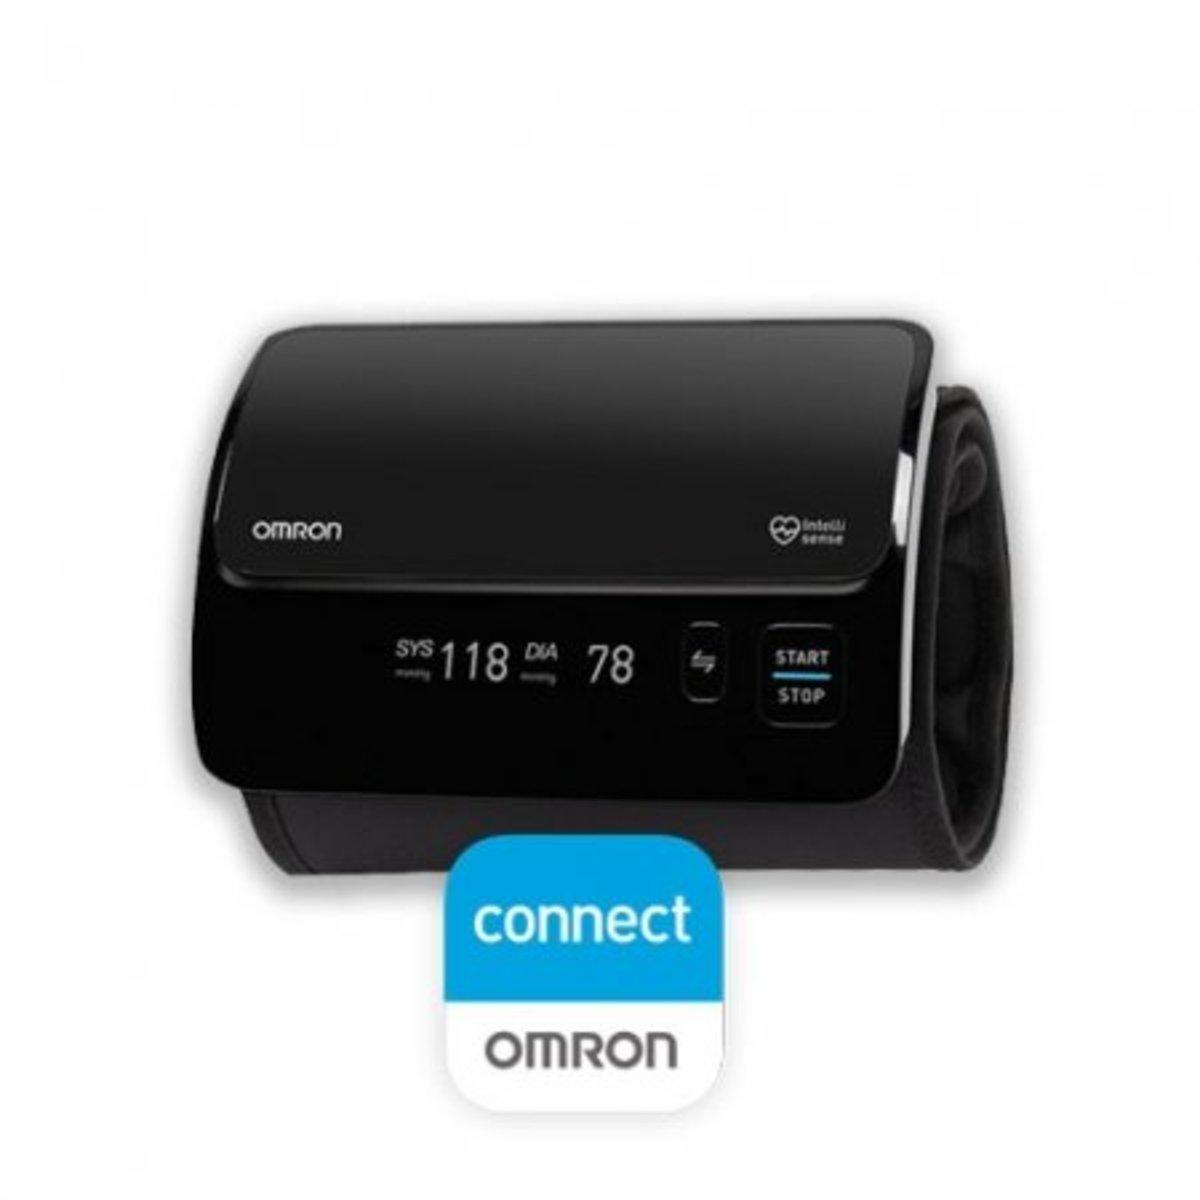 HEM-7600T Upper Arm Blood Pressure Monitor